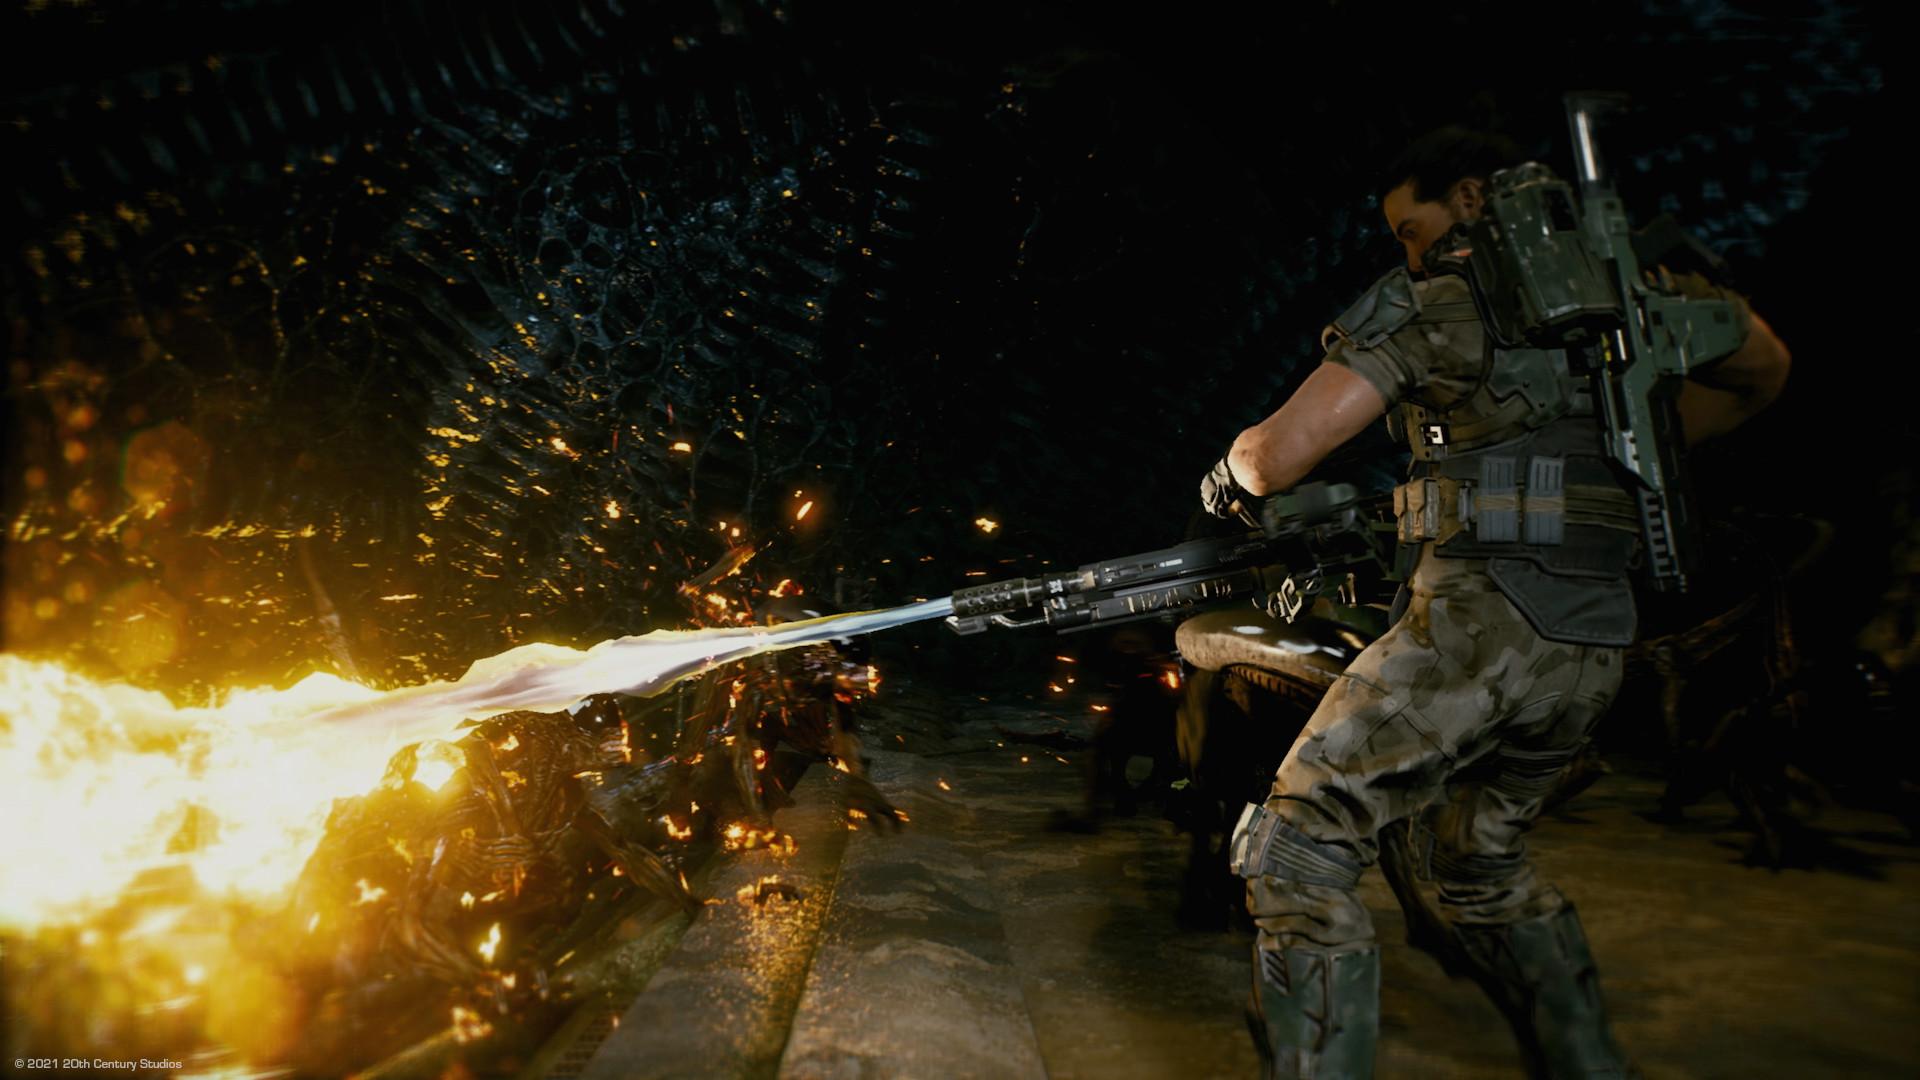 Aliens: Fireteam Xbox Series X & S